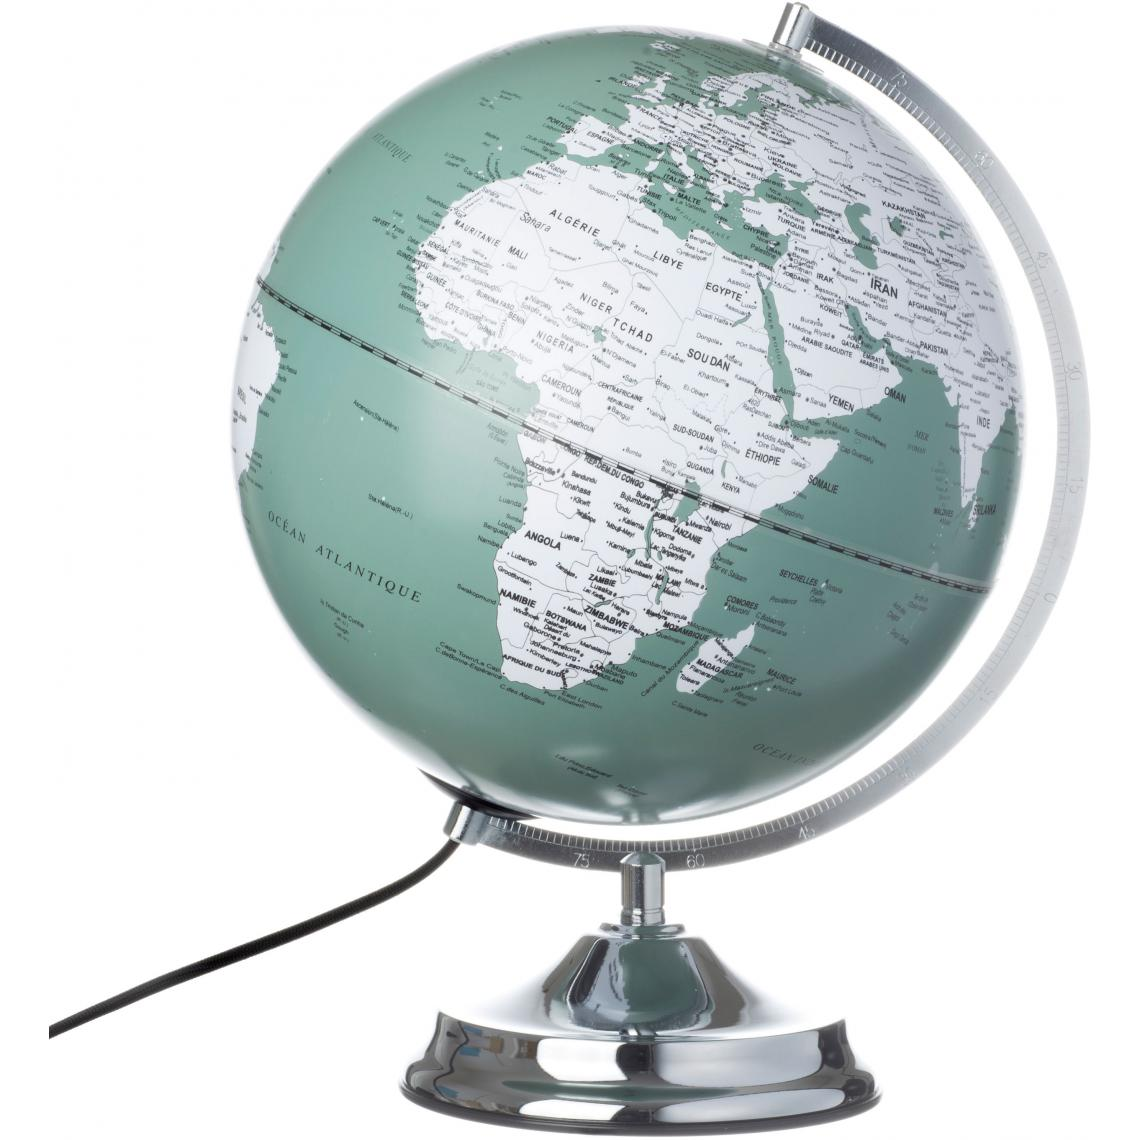 Poser Globe Lampe À World3 Vert Lumineux Suisses wkN8POn0X